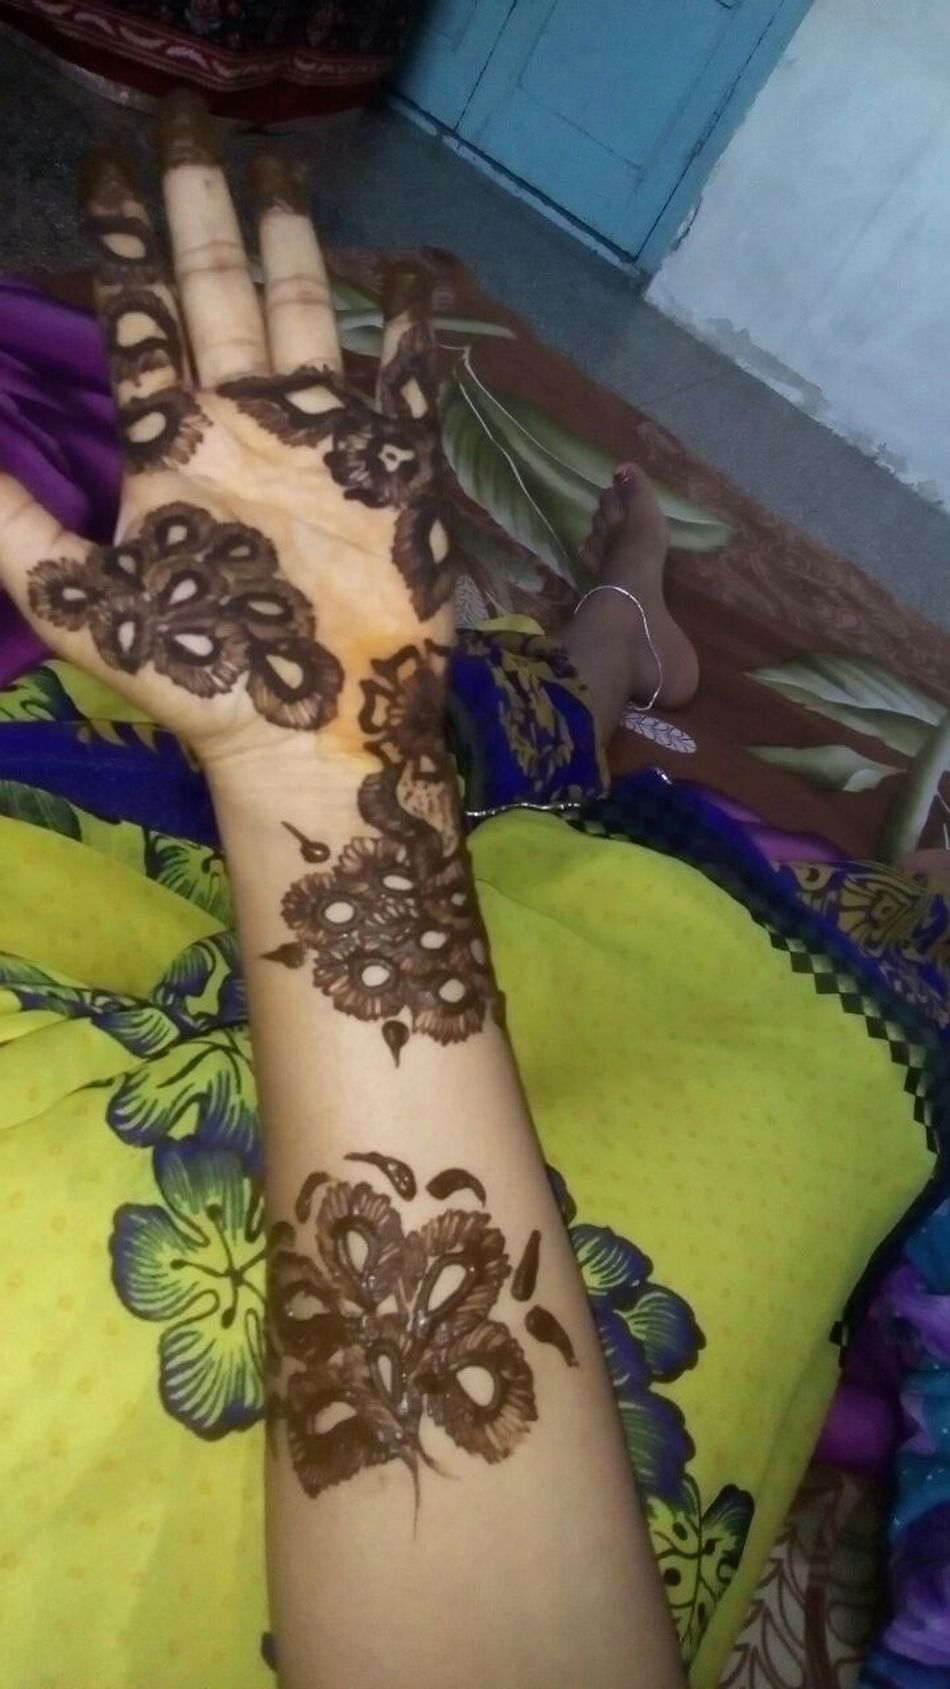 Henna Tattoo ❤ Henna Tattoo Design High Angle View Close-up Human Body Part Human Hand Art And Craft Creativity Art Parasngupta_photography